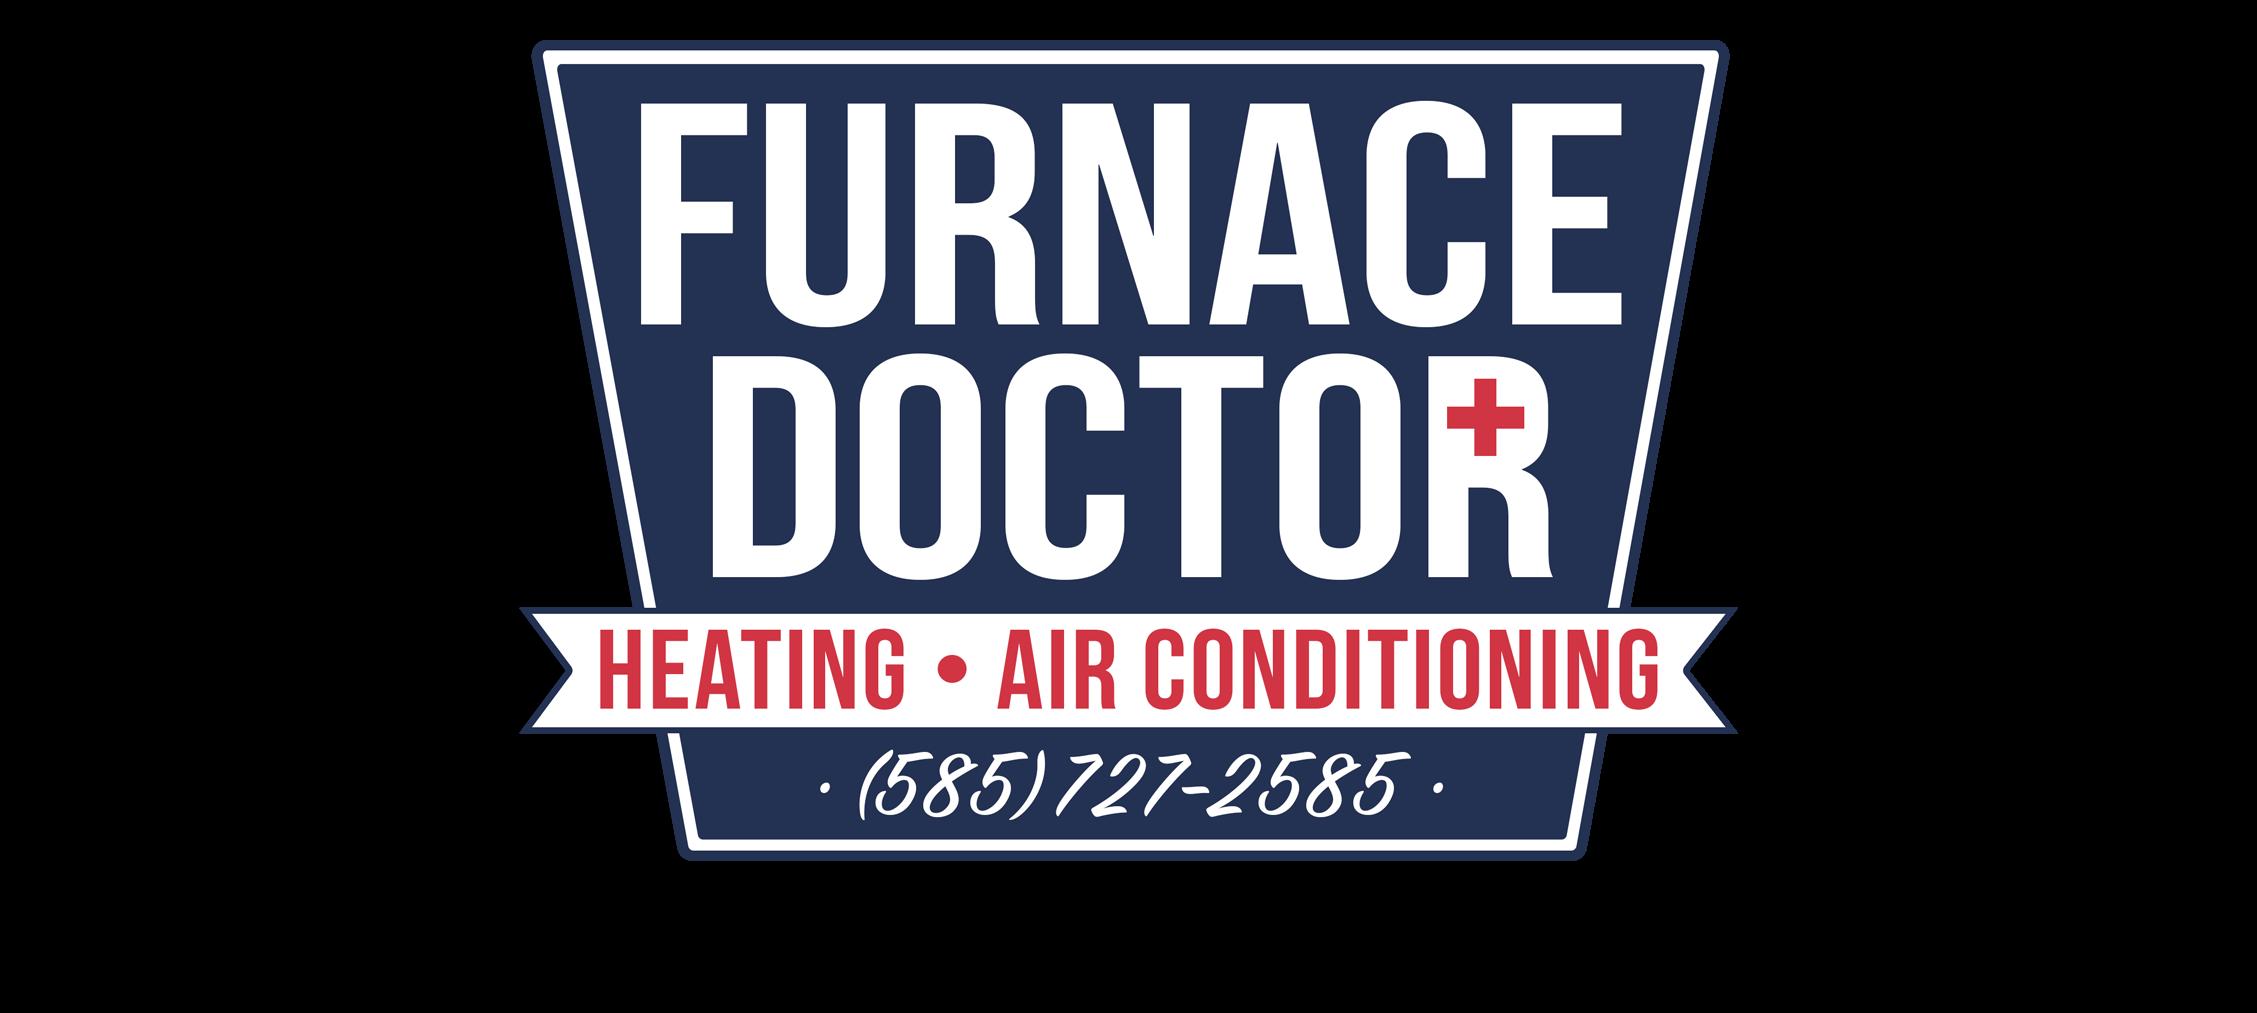 Furnace-Doctor NY HVAC Heating & Cooling